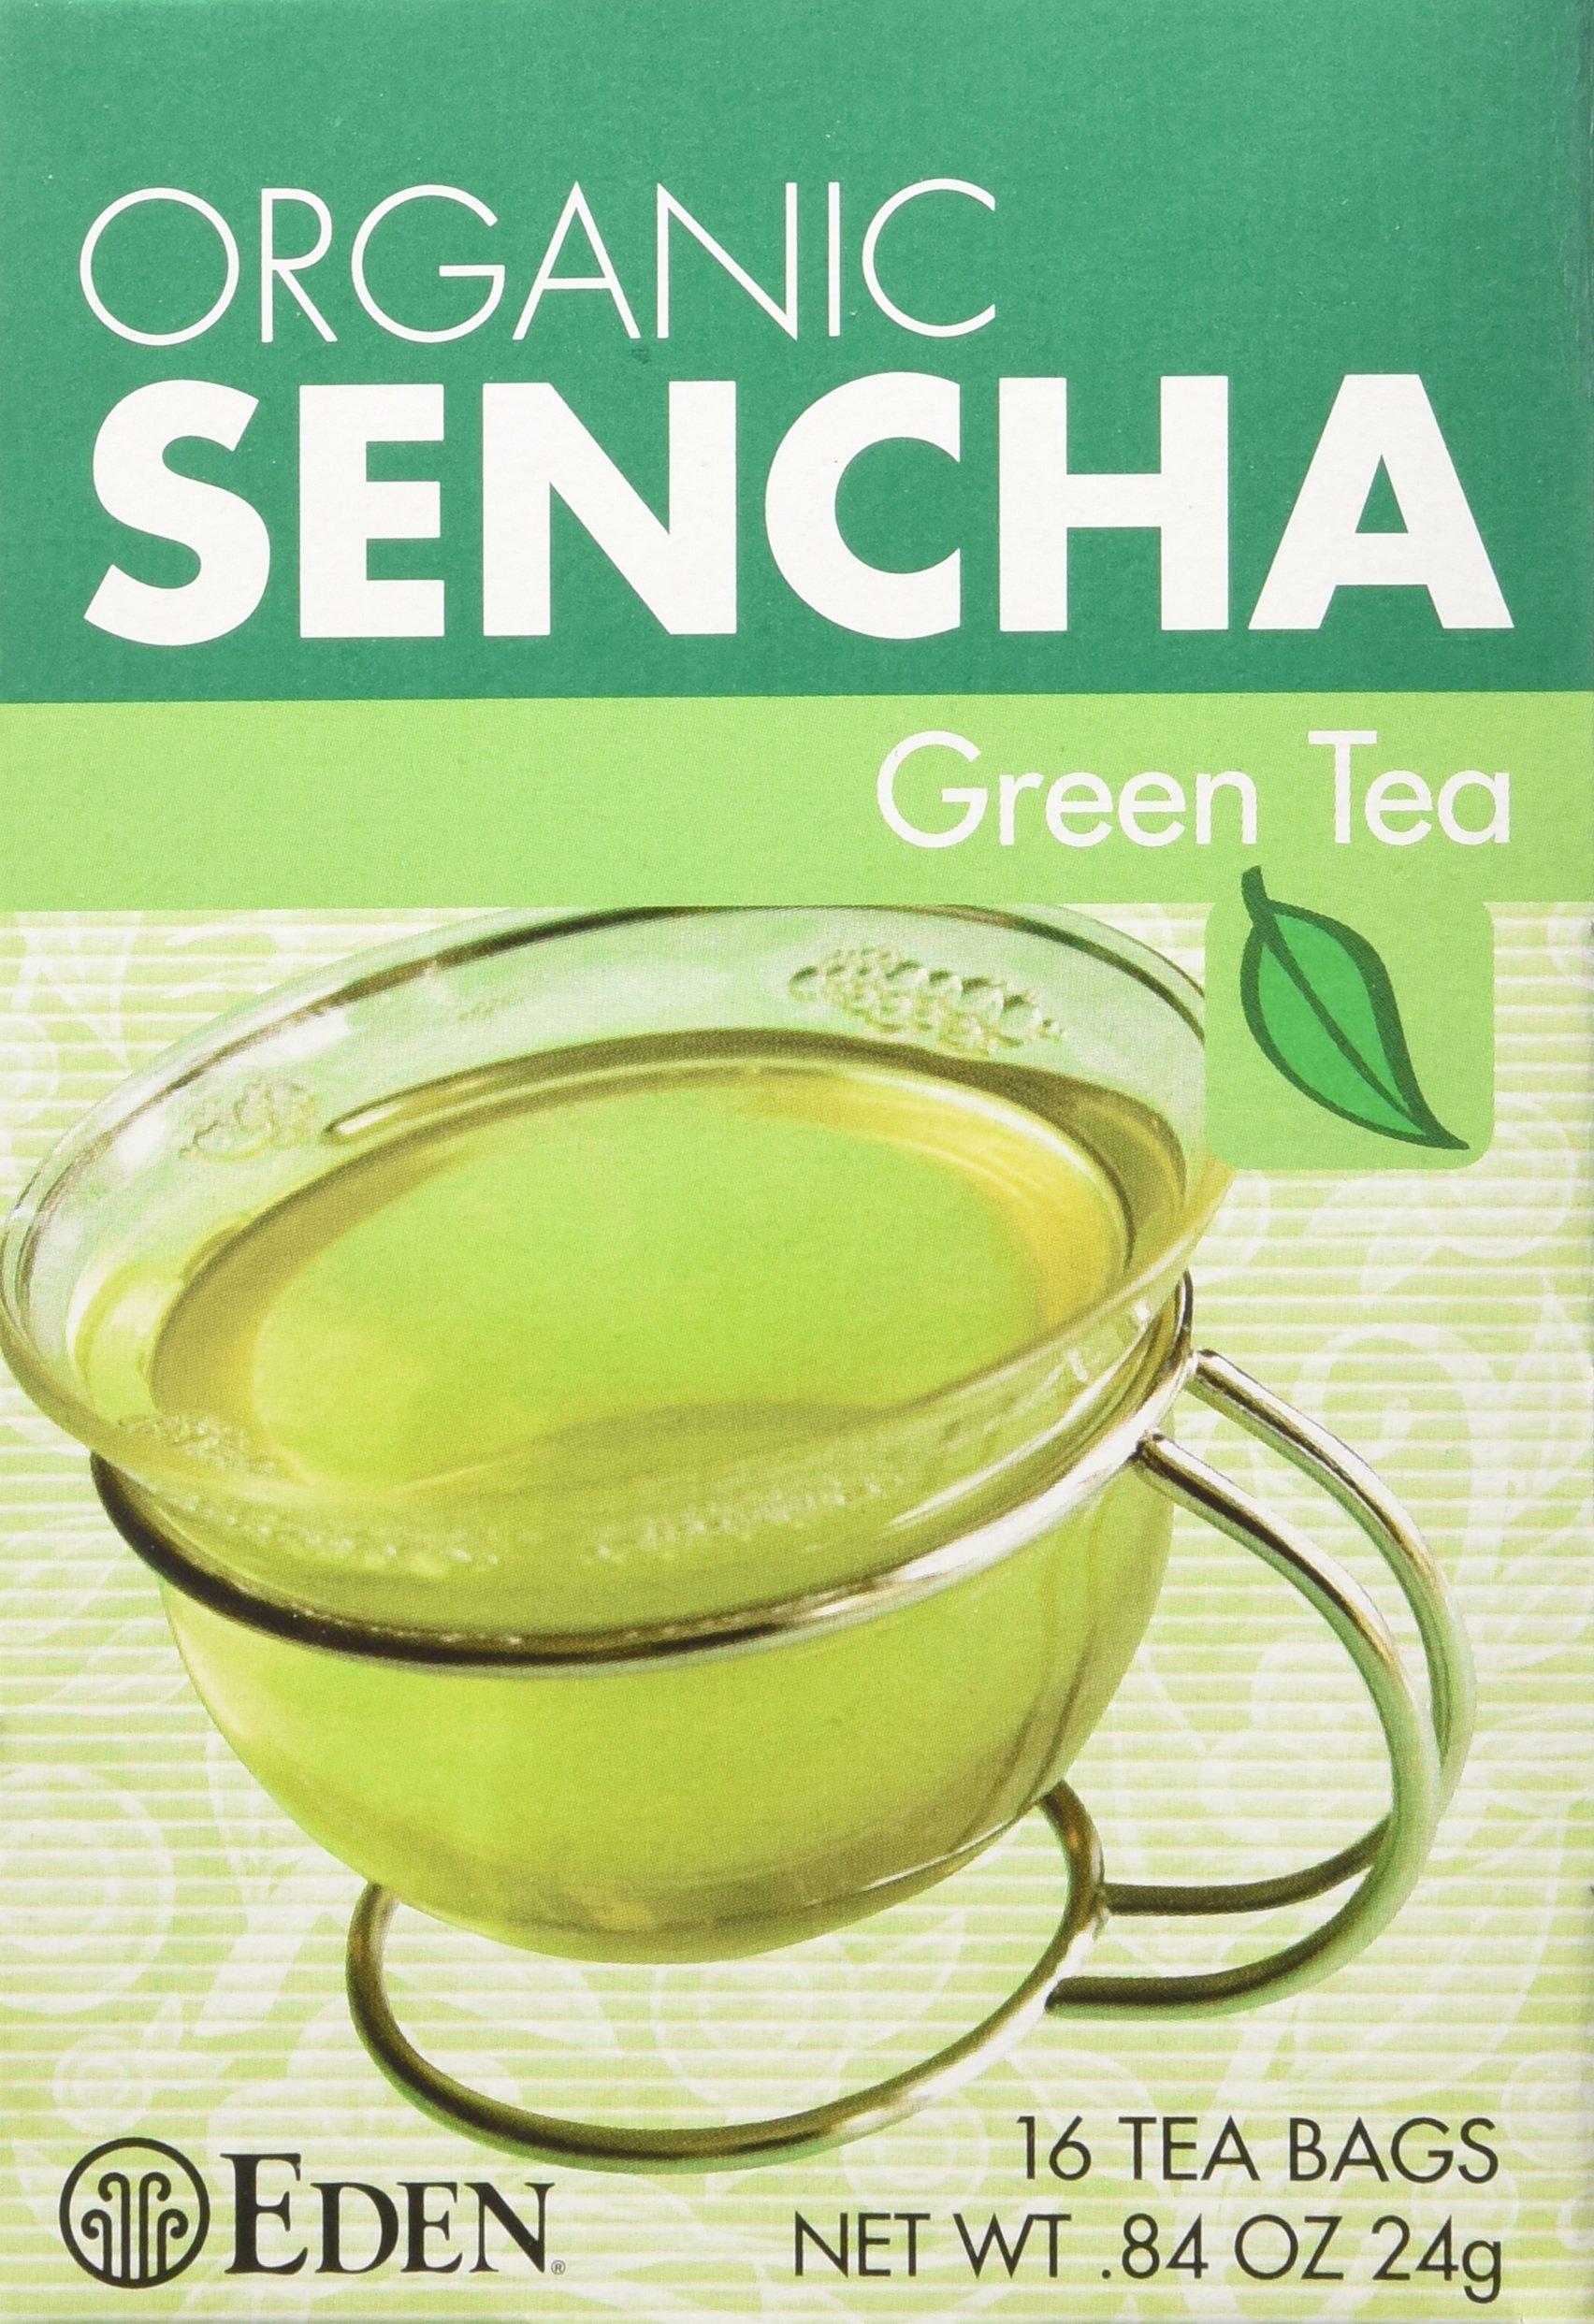 Eden Organic Green Tea, Sencha, Tea Bags, 16-Count Boxes (Pack of 12) by Eden